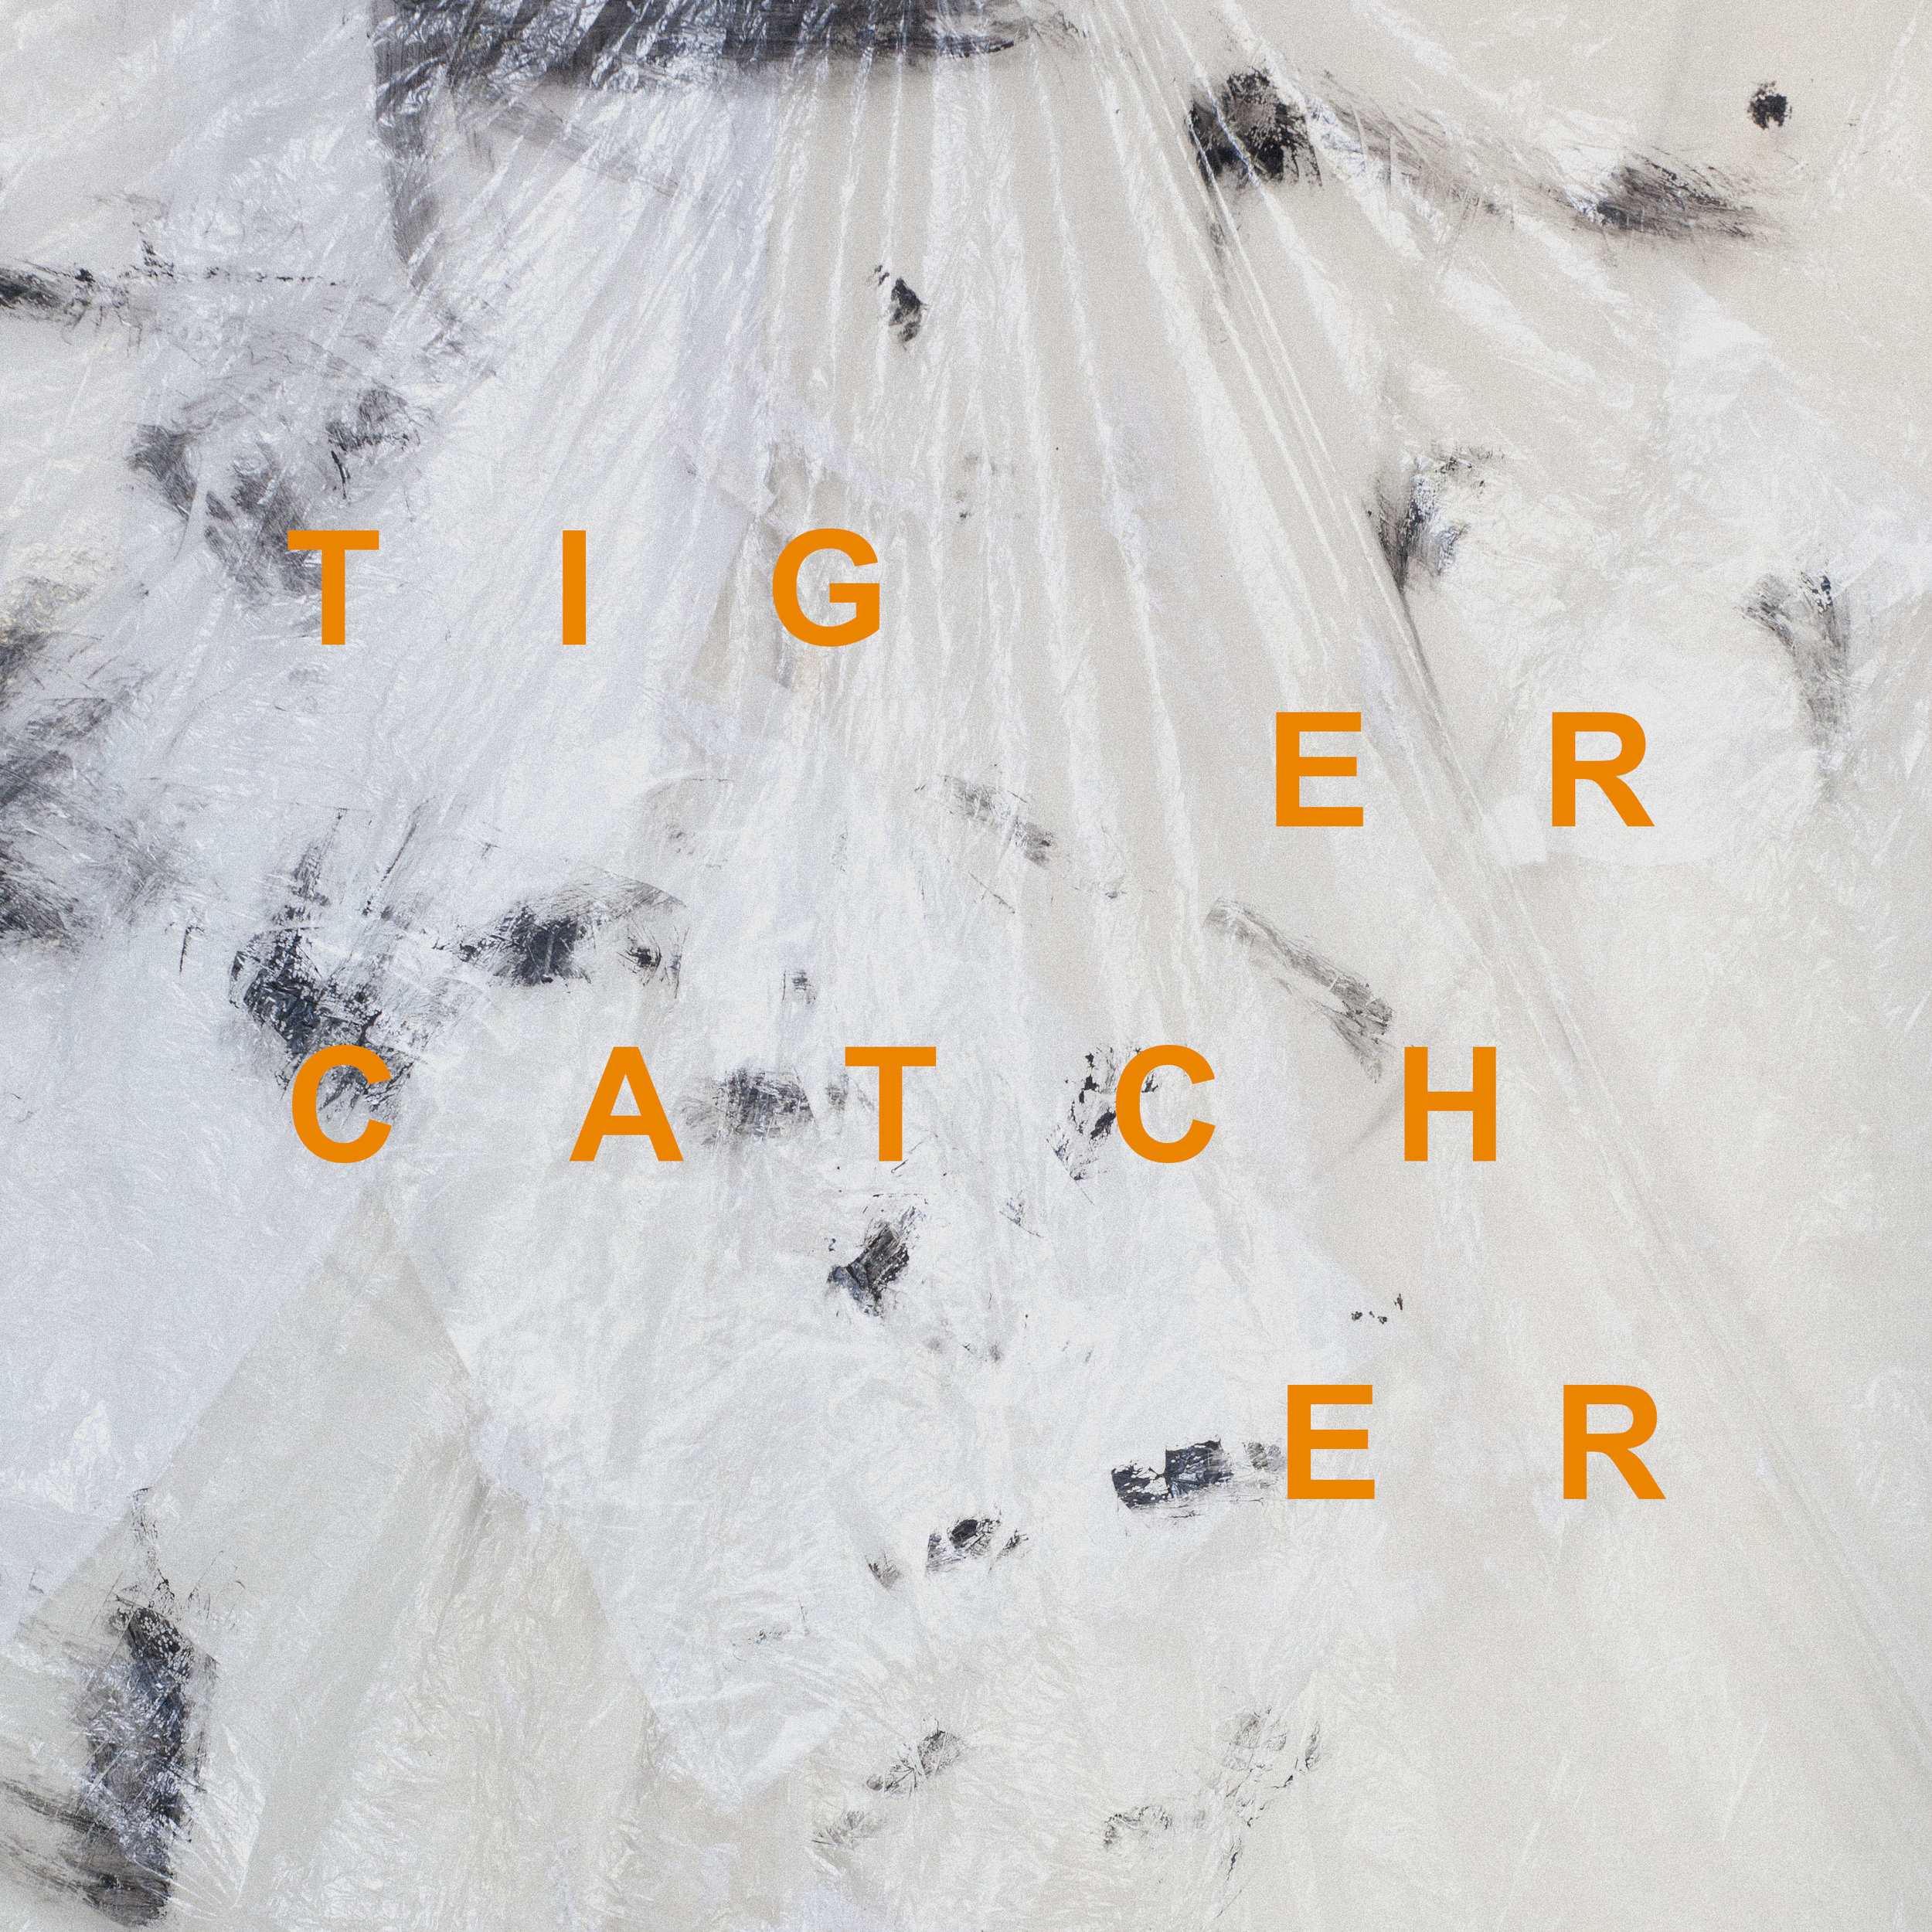 20171216_TigerCatcher_IG_INTRO.jpg